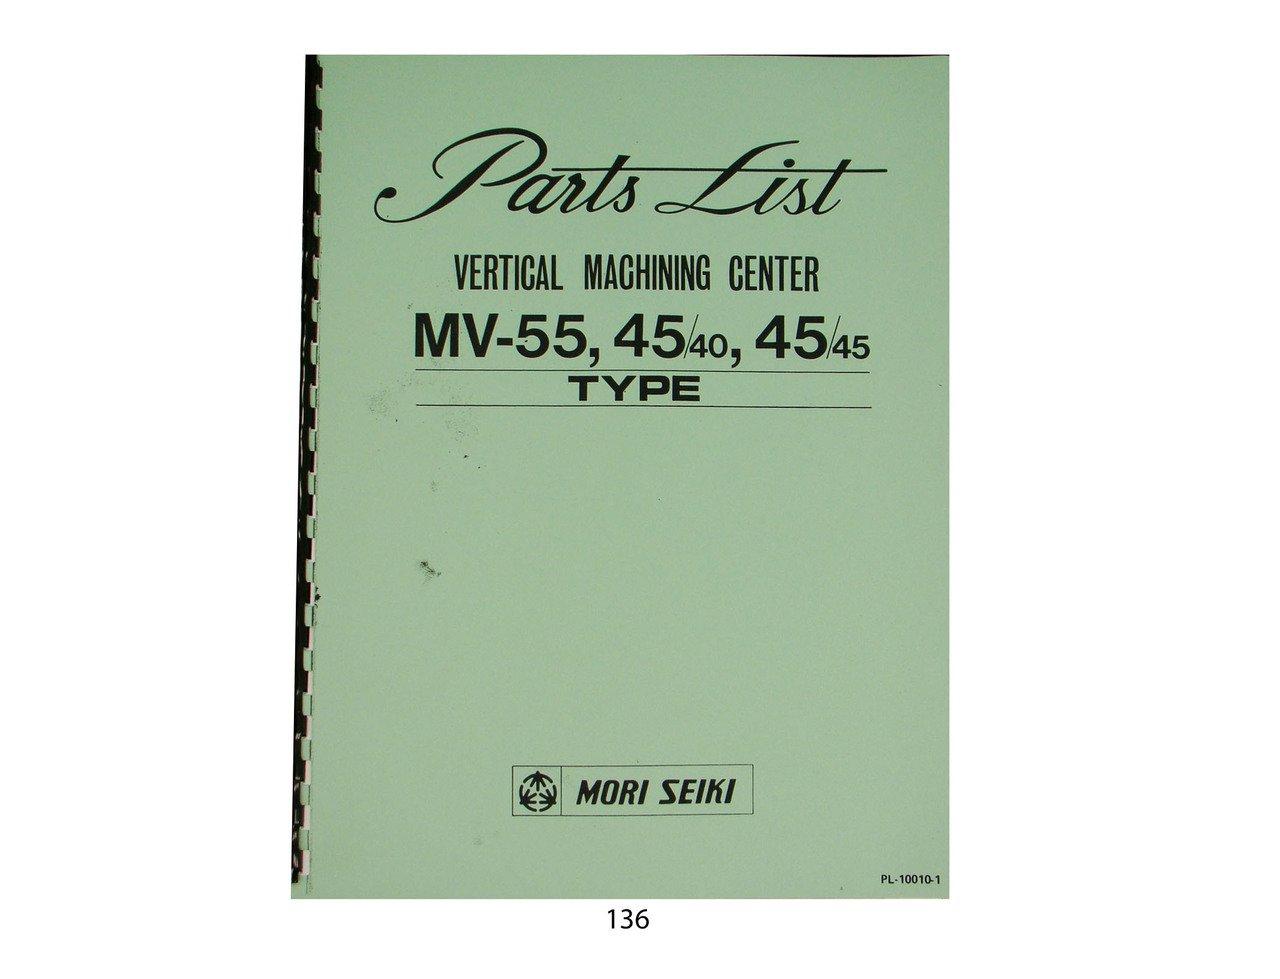 Mori Seiki MV-55, 45/40, 45/45 Vertical Maching Center Parts List Manual: Mori  Seiki: Amazon.com: Books